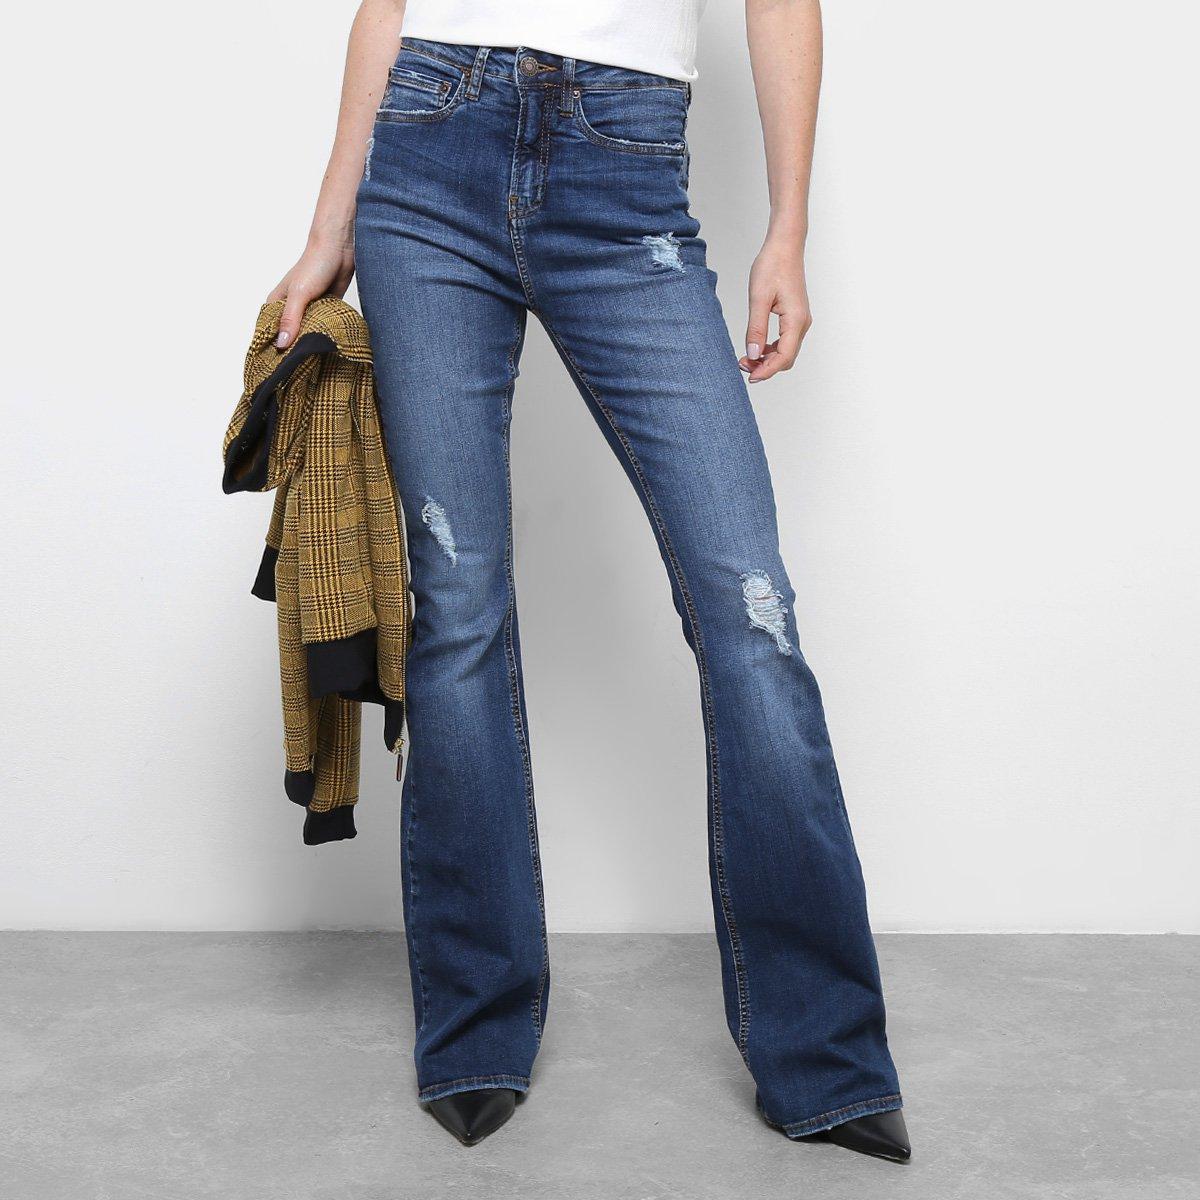 9a68a7d29 Calça Jeans Flare Calvin Klein Five Pockets Cintura Média Feminina |  Netshoes